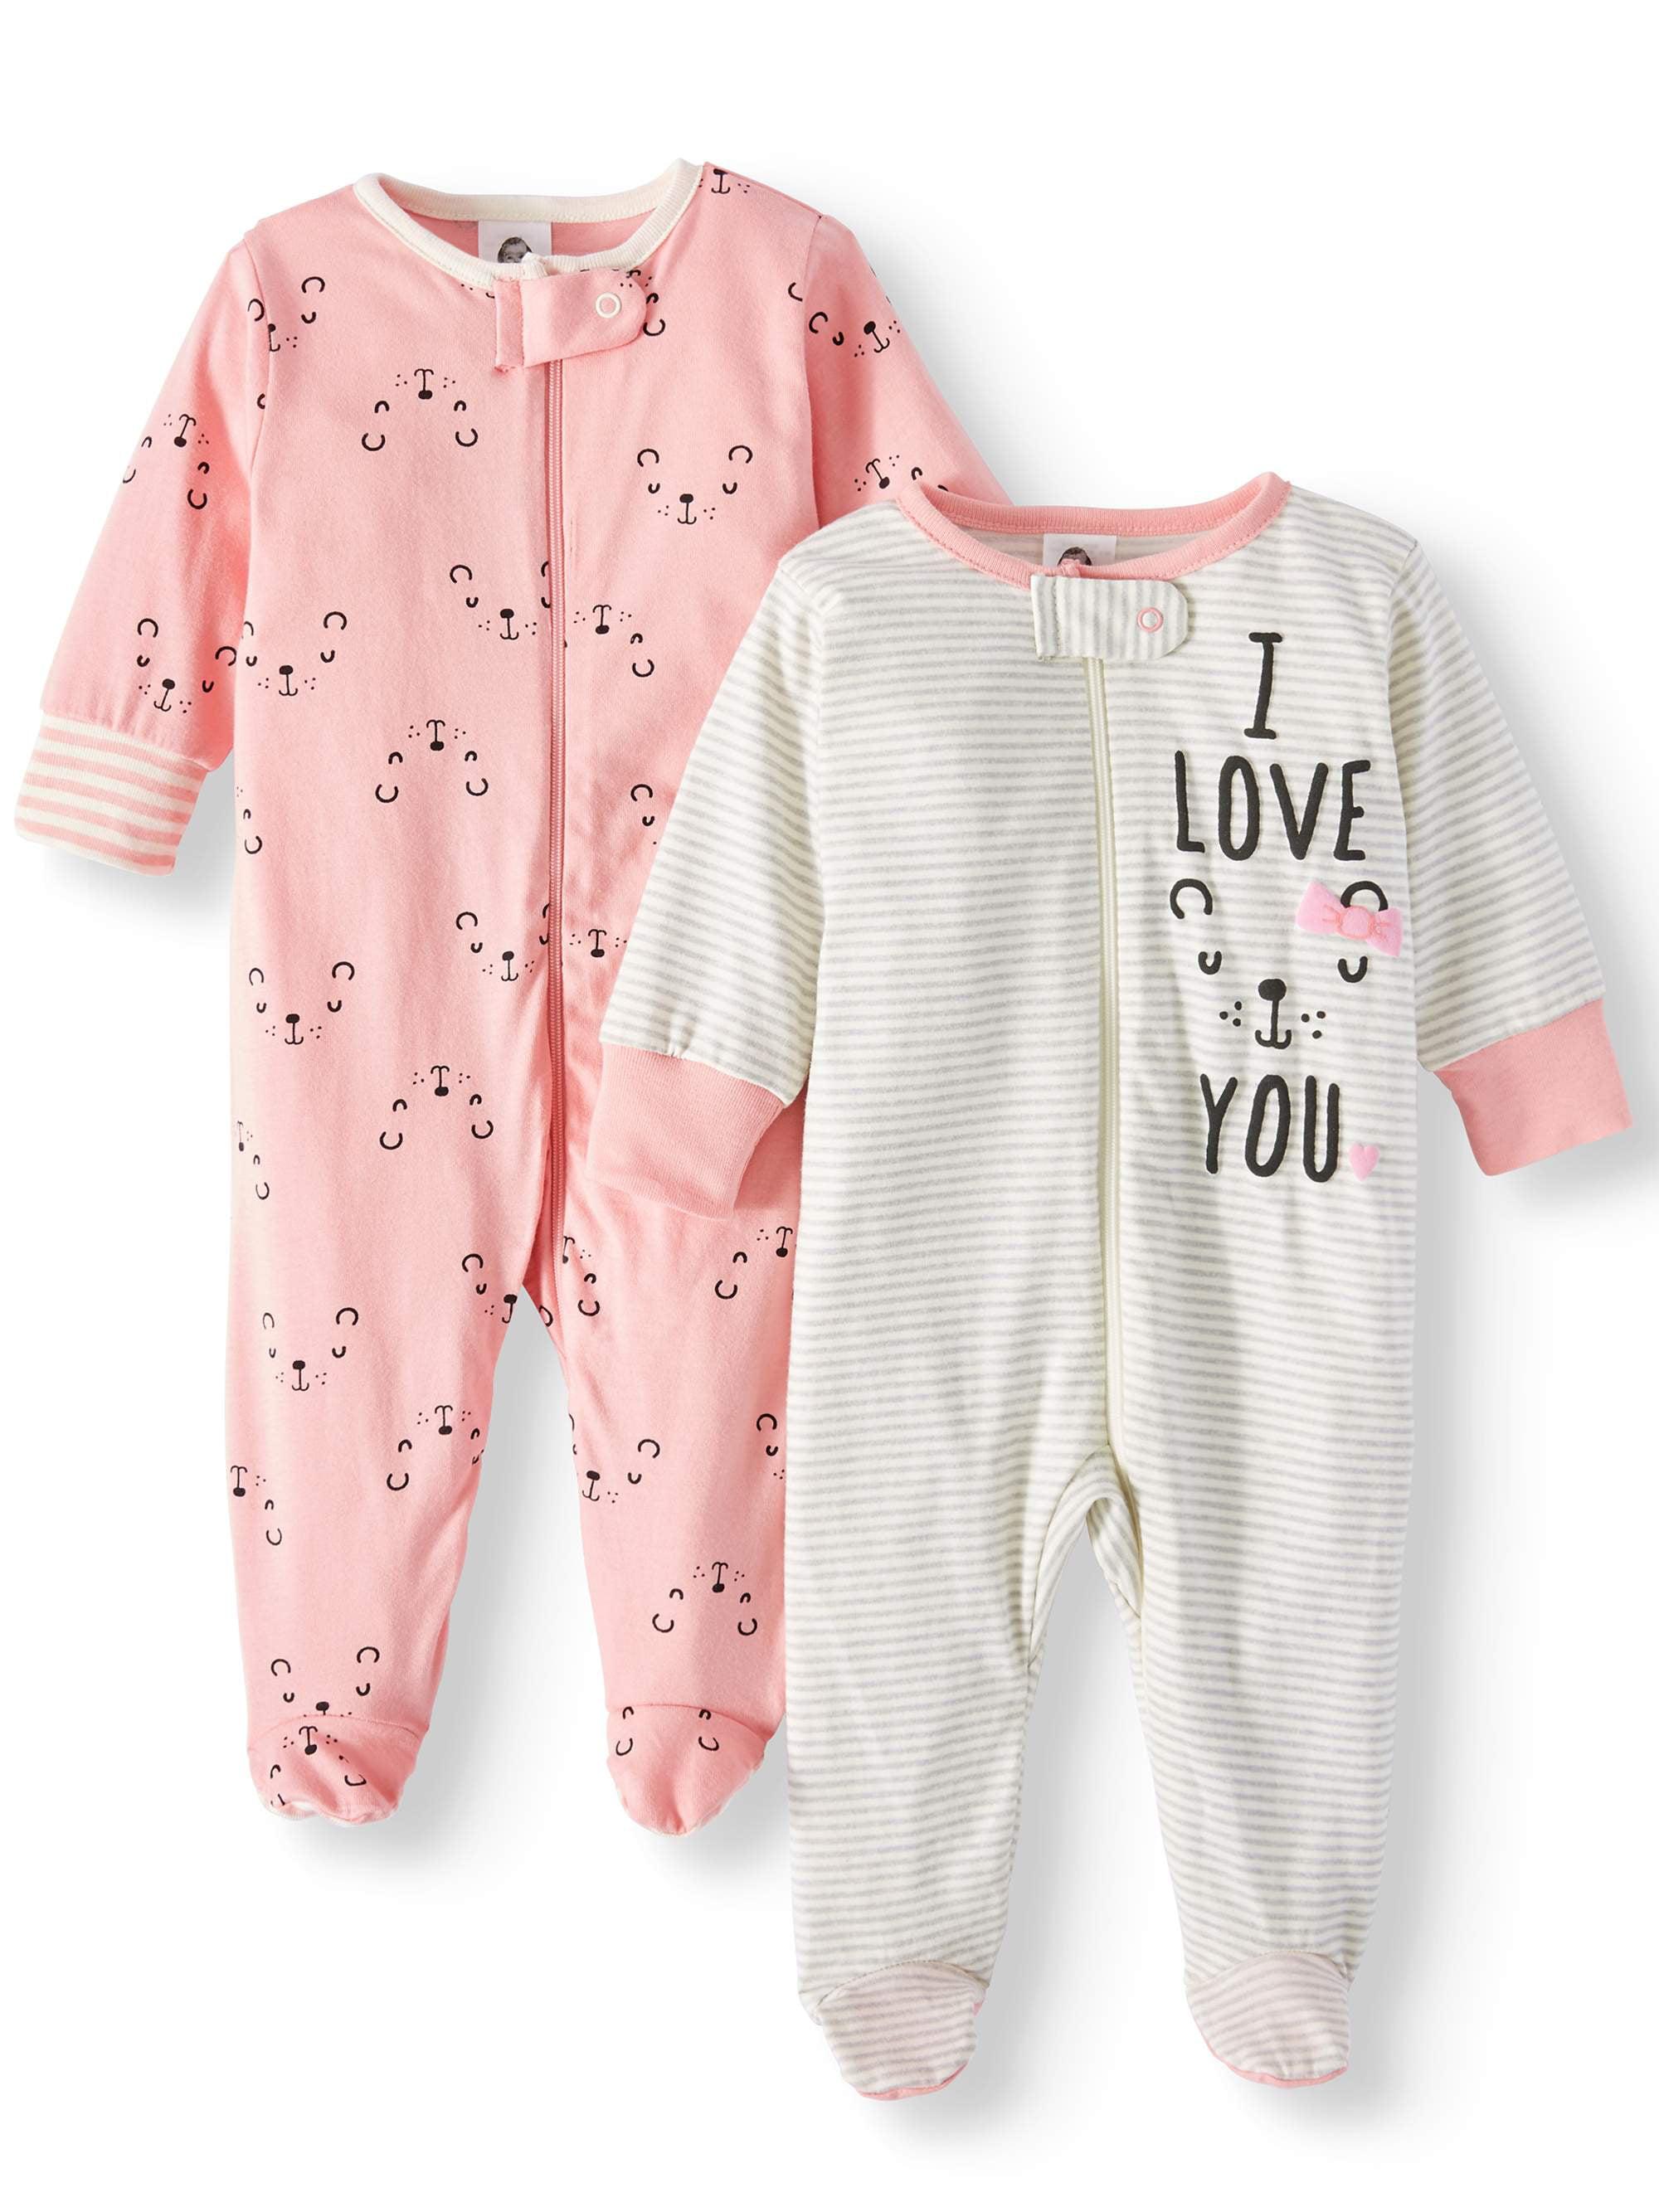 Violinist Love Heart Baby Boy Girl Essential Basic Pajamas Sleeper